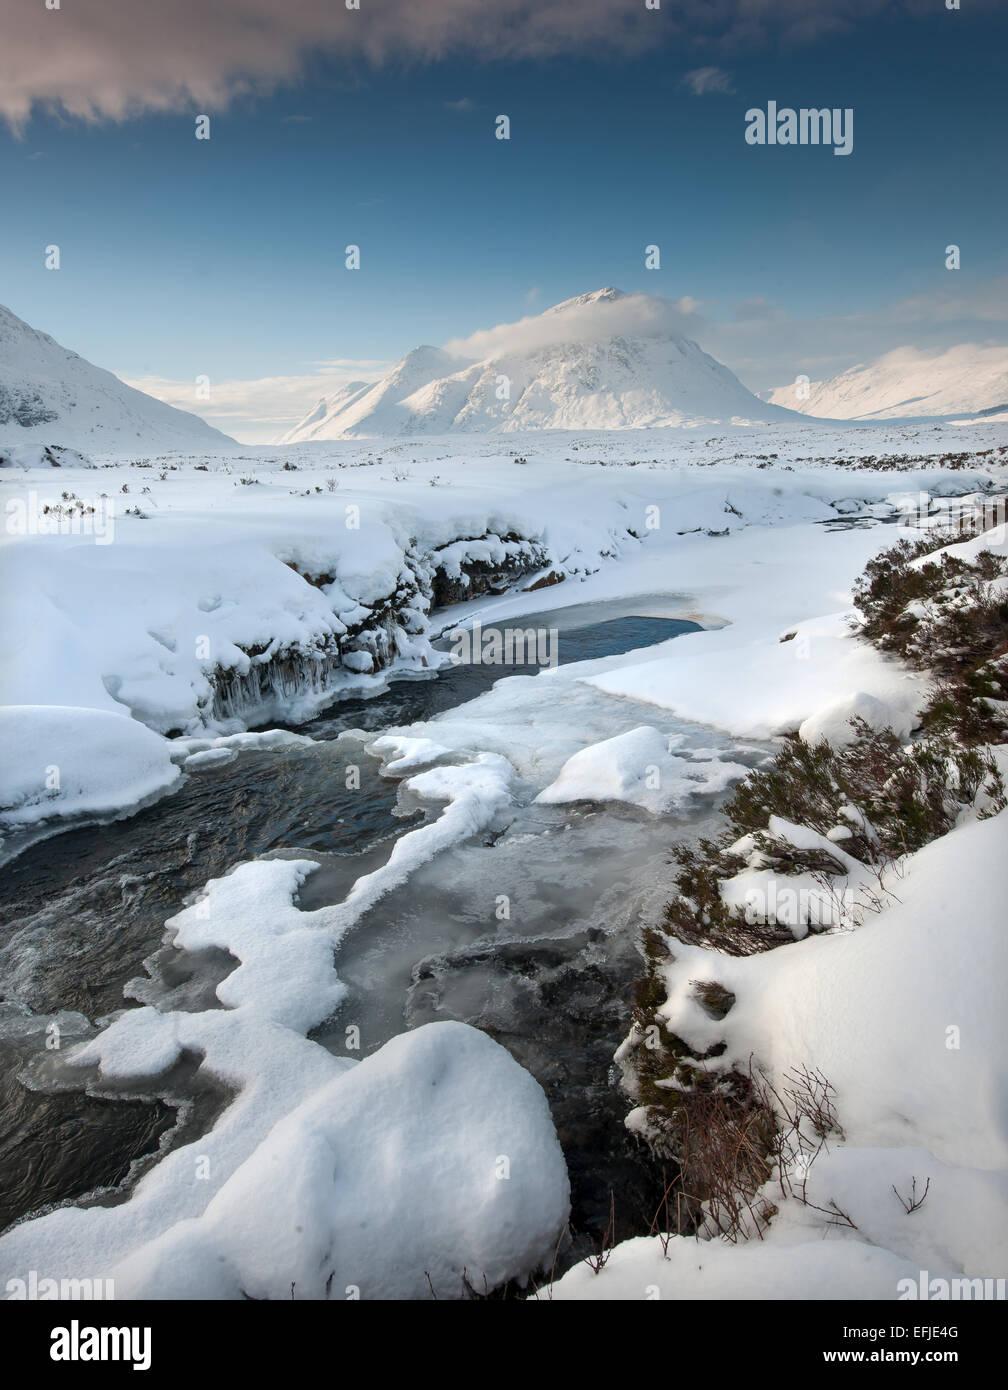 Winter view towards Buachaille Etive Mhor, Glencoe, West Highlands - Stock Image